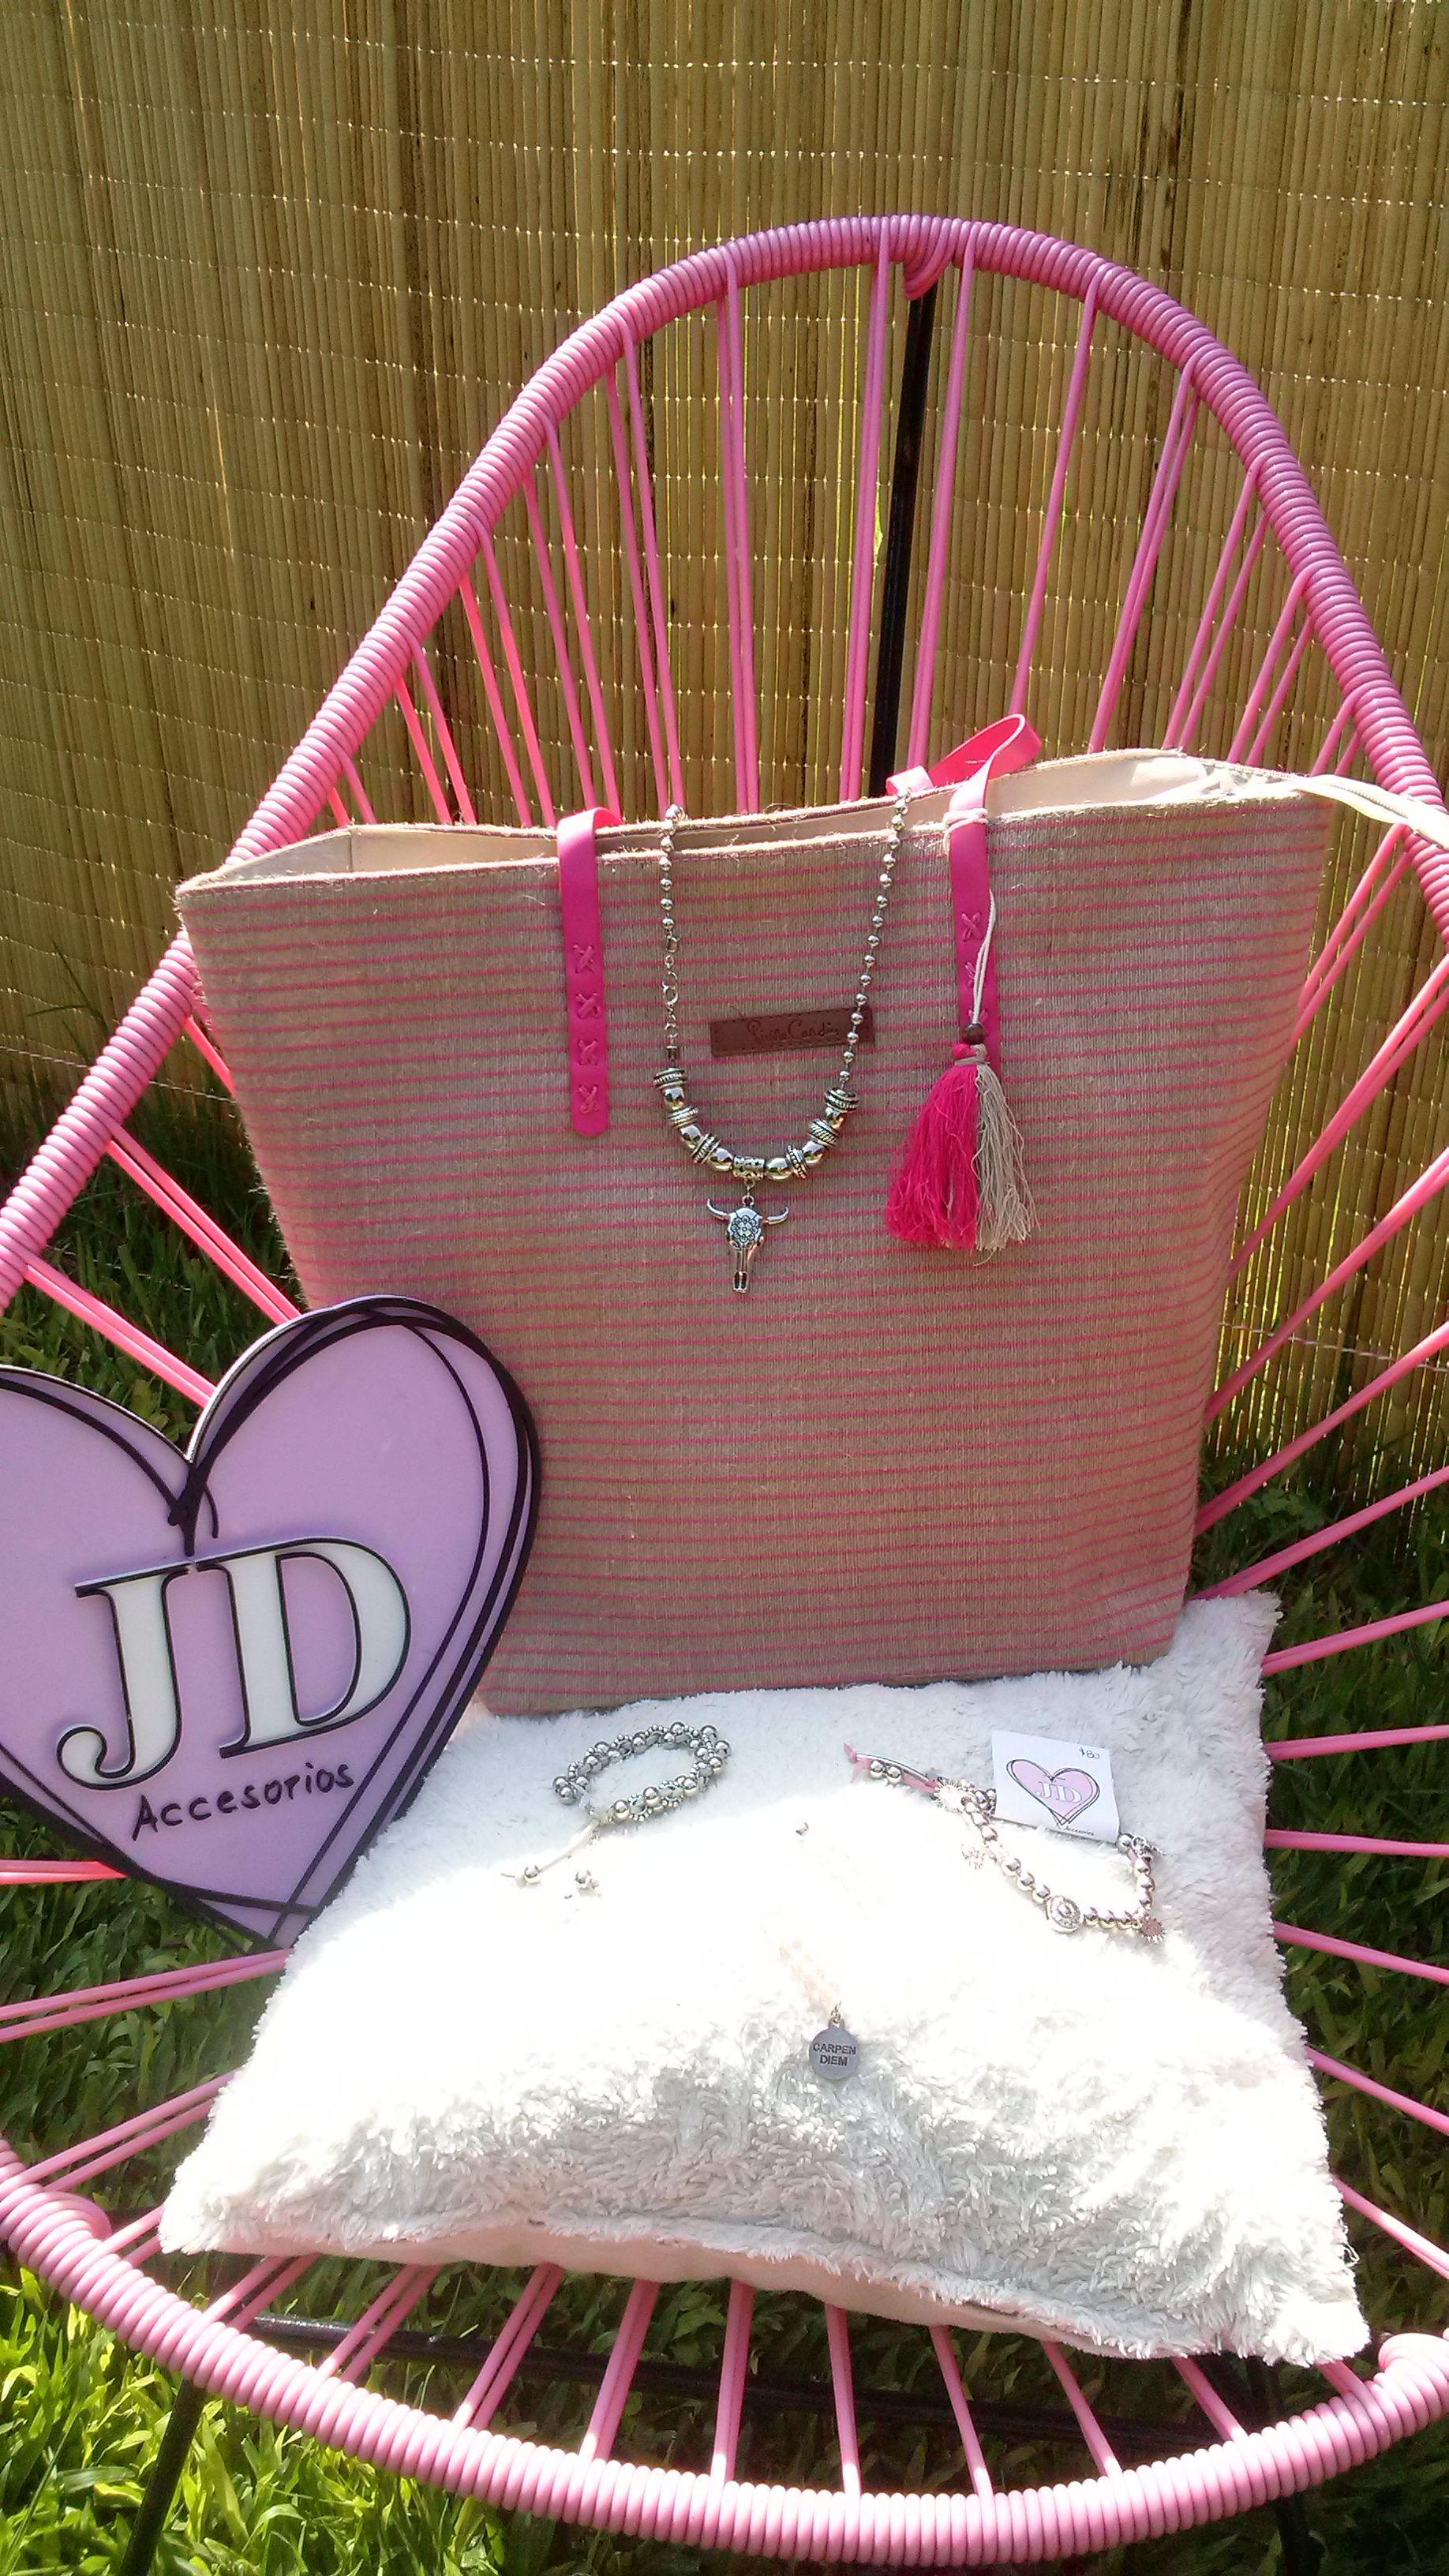 Bolso#pulseras#collar#JD#bijou#moda https://www.facebook.com/jdaccesorios1/?fref=ts